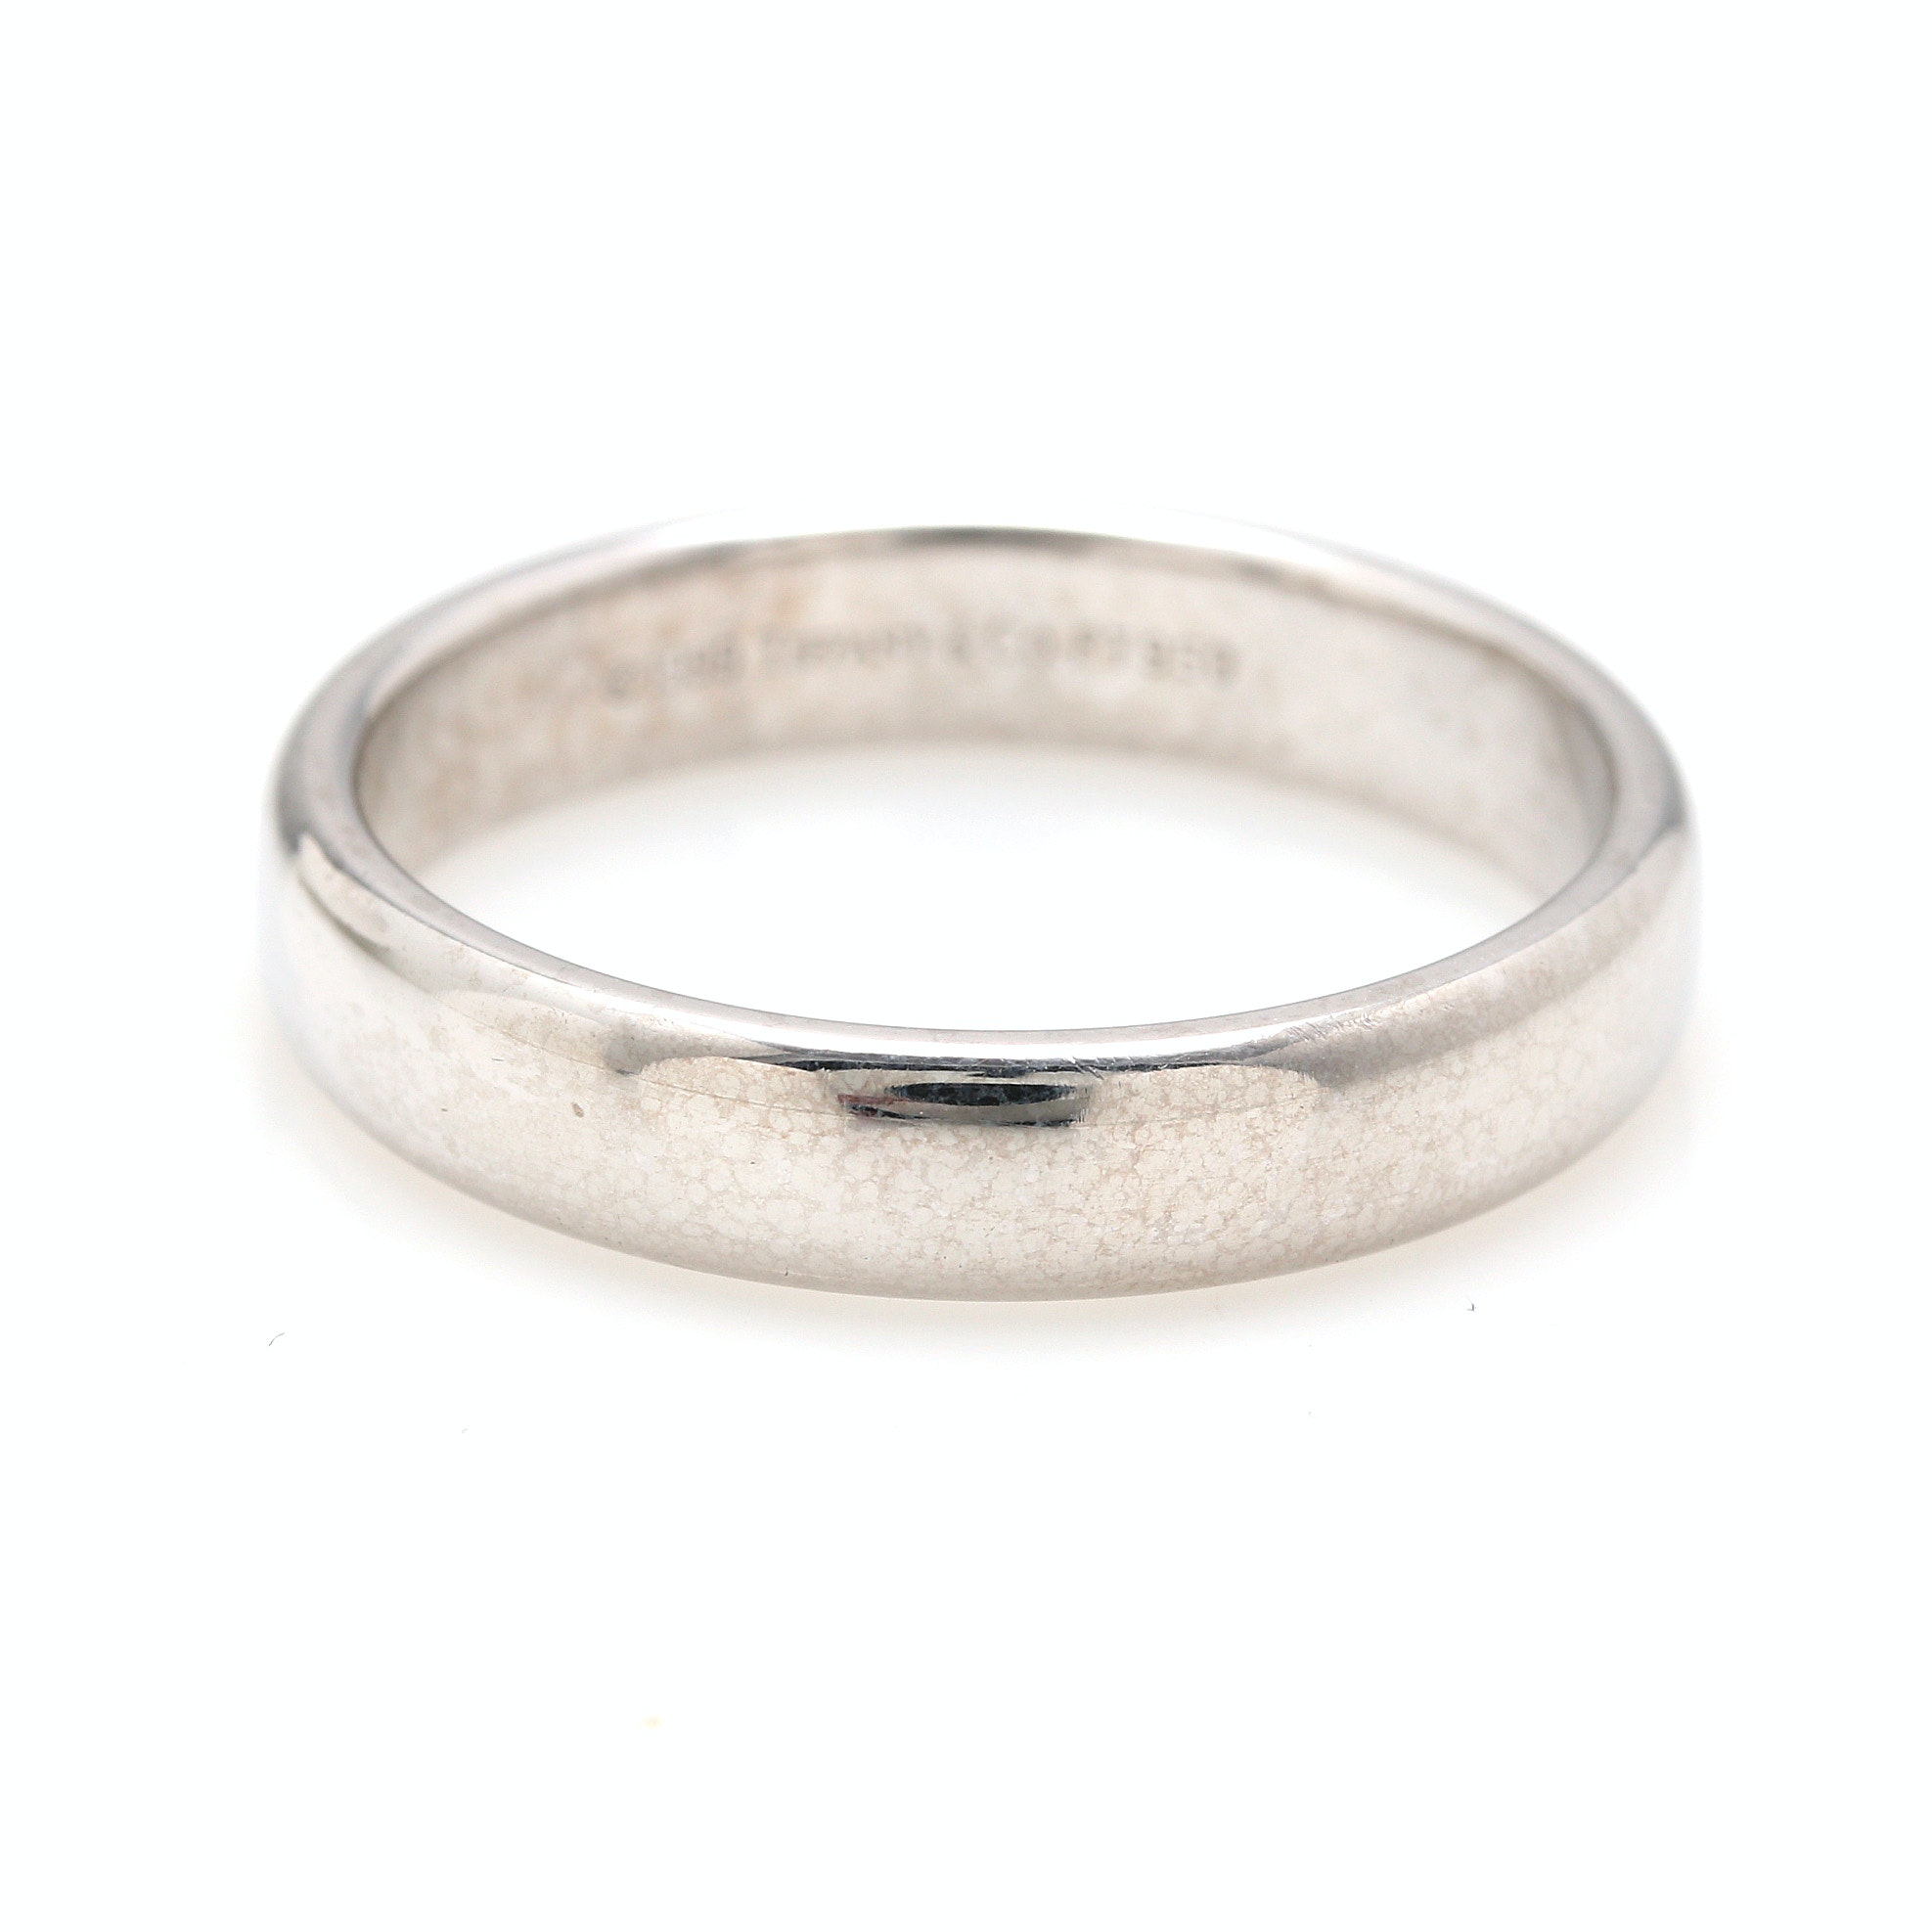 Tiffany & Co. Platinum Ring Band